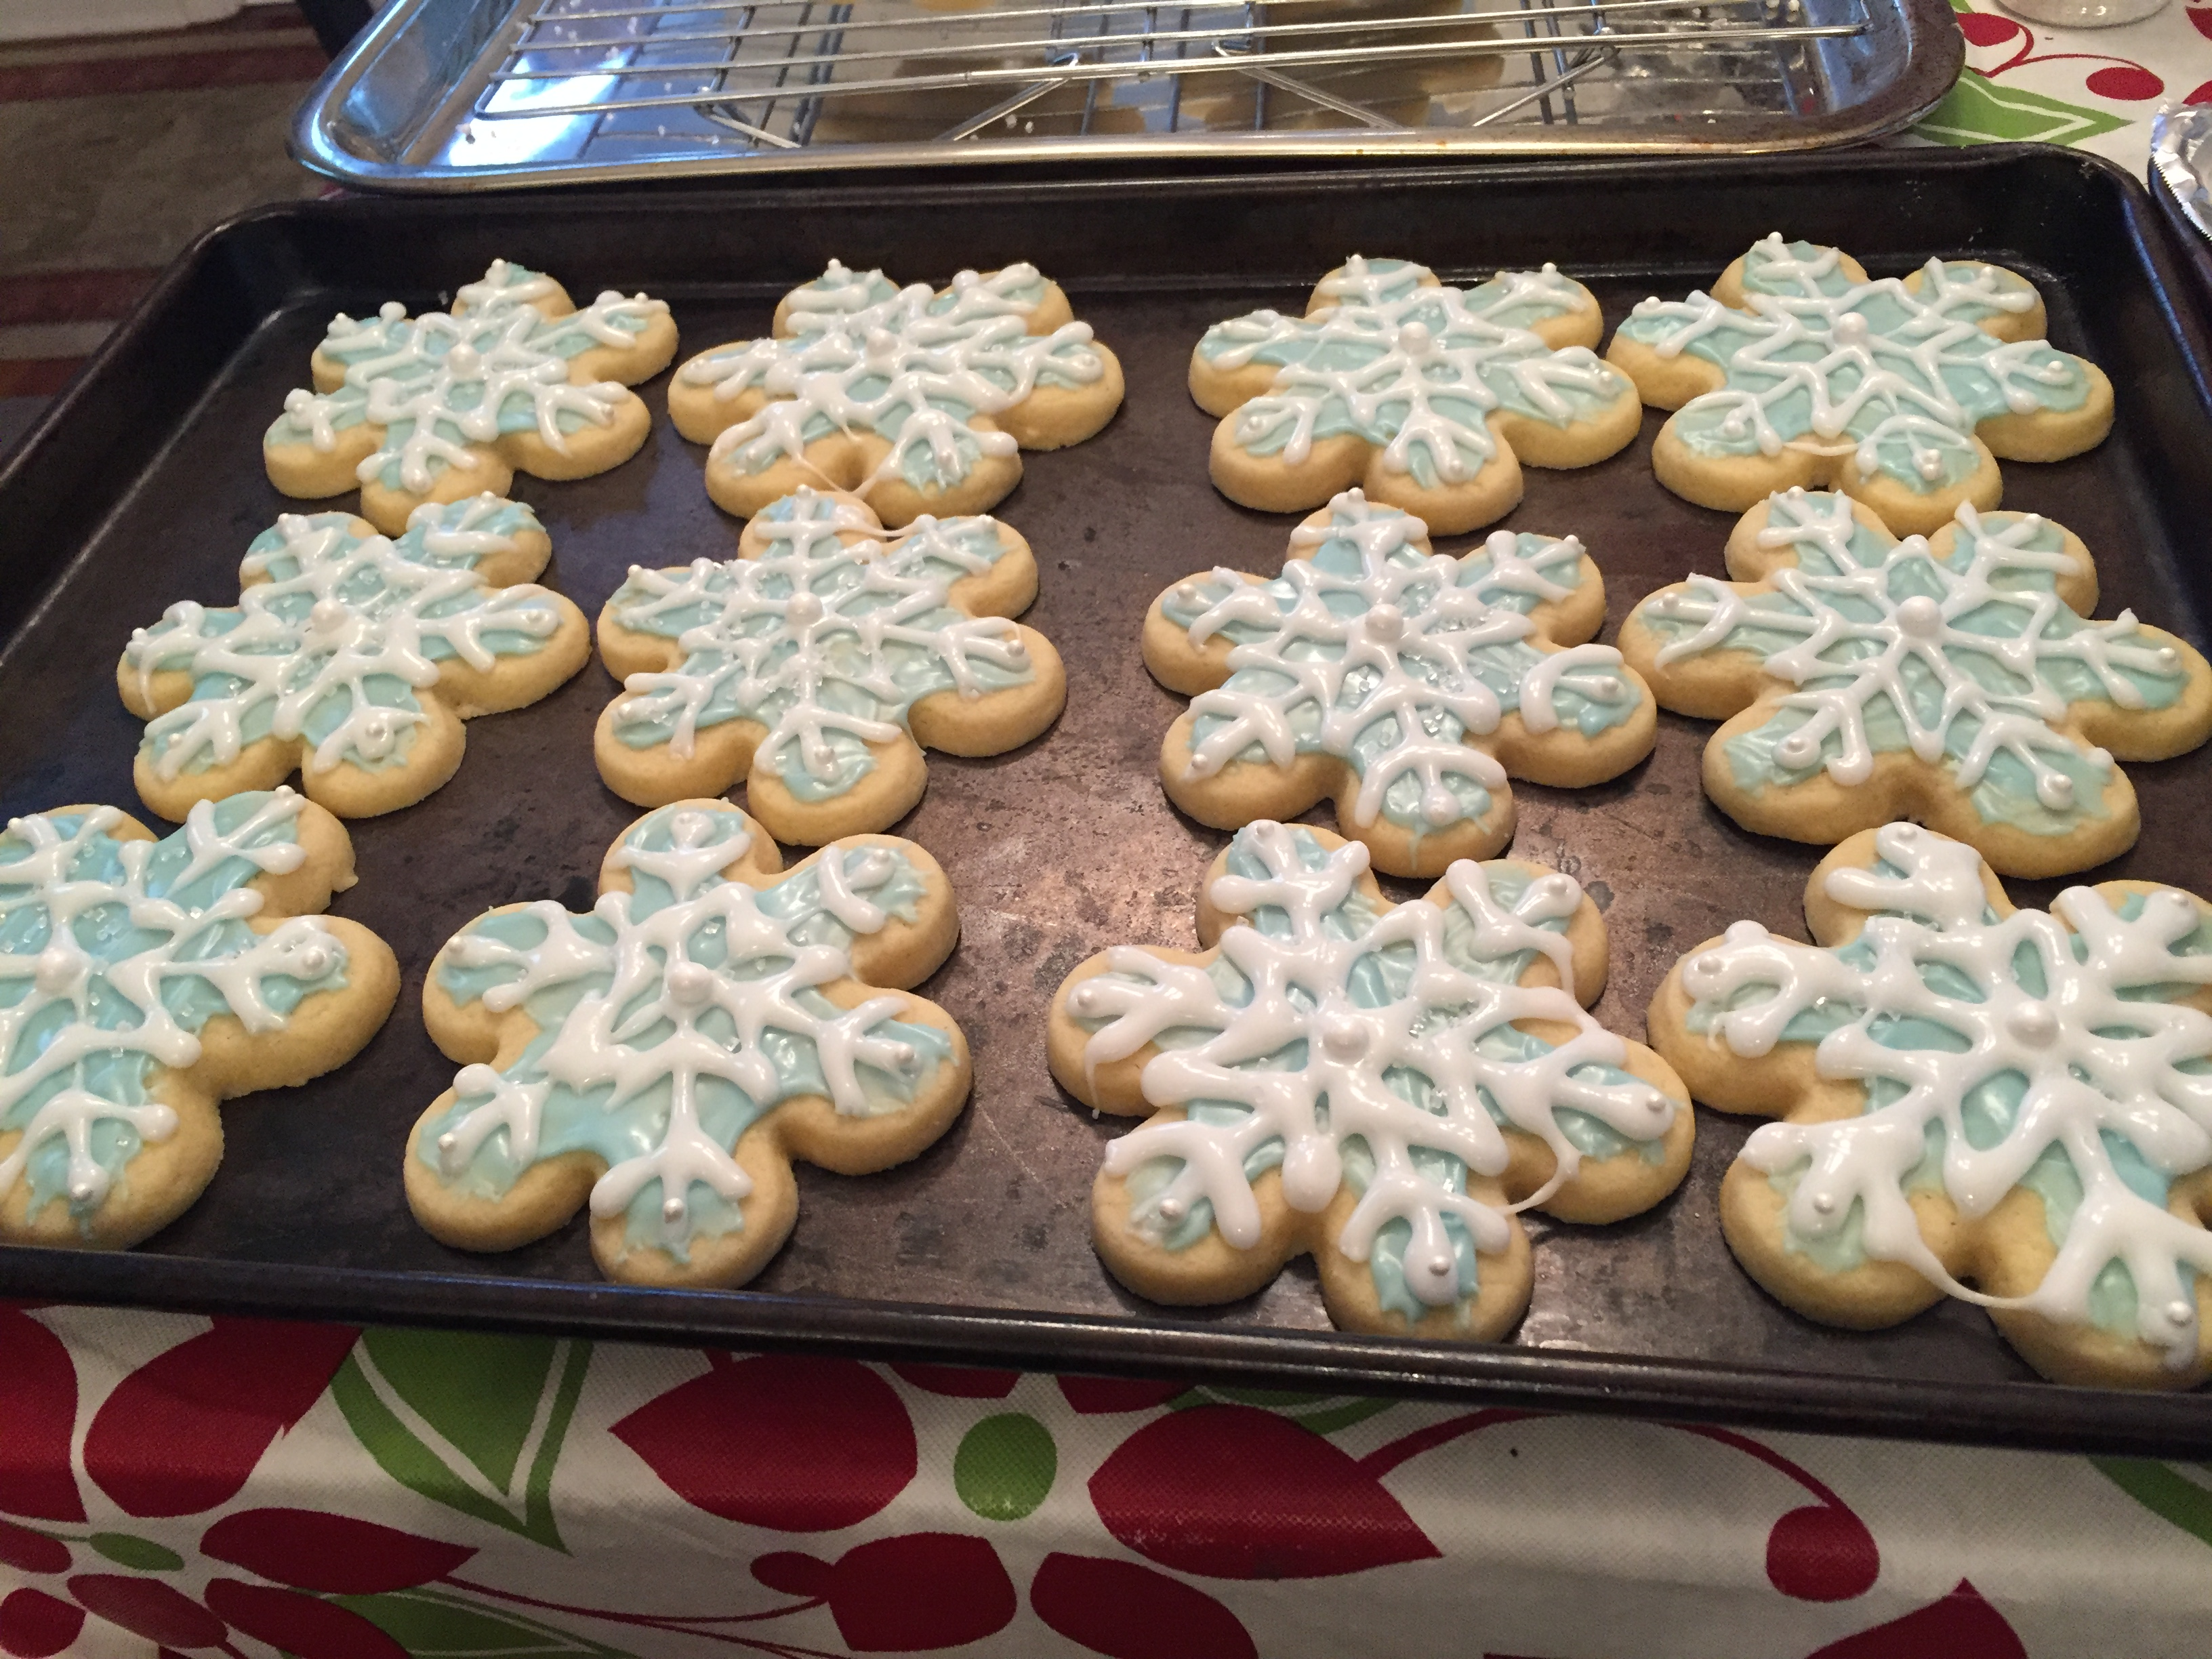 Sugar Cookie Icing Ivy C. Tiu